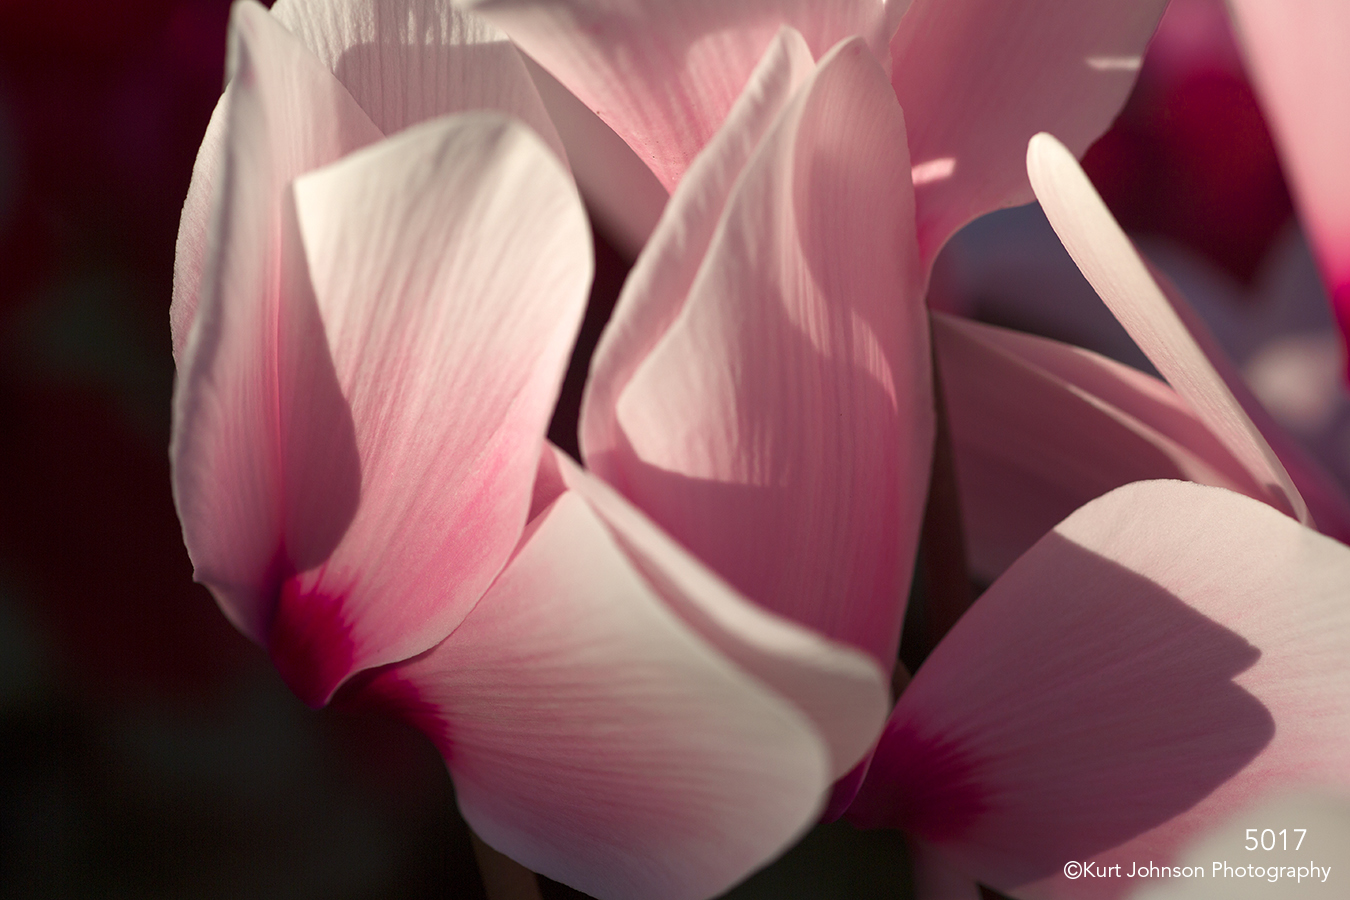 flower pink petals texture abstract details close up